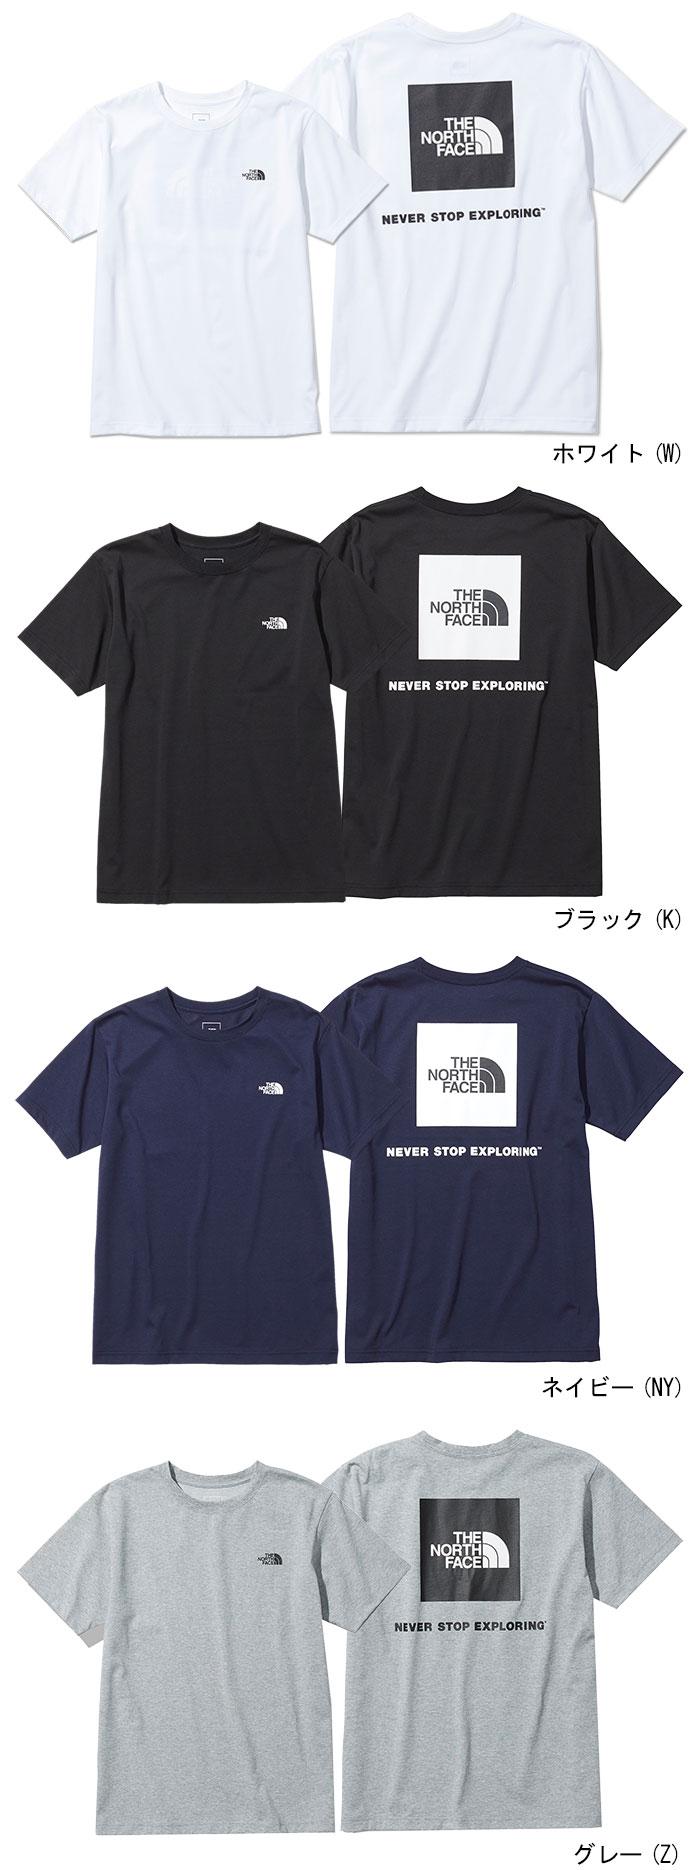 THE NORTH FACEザ ノースフェイスのTシャツ Back Square Logo06